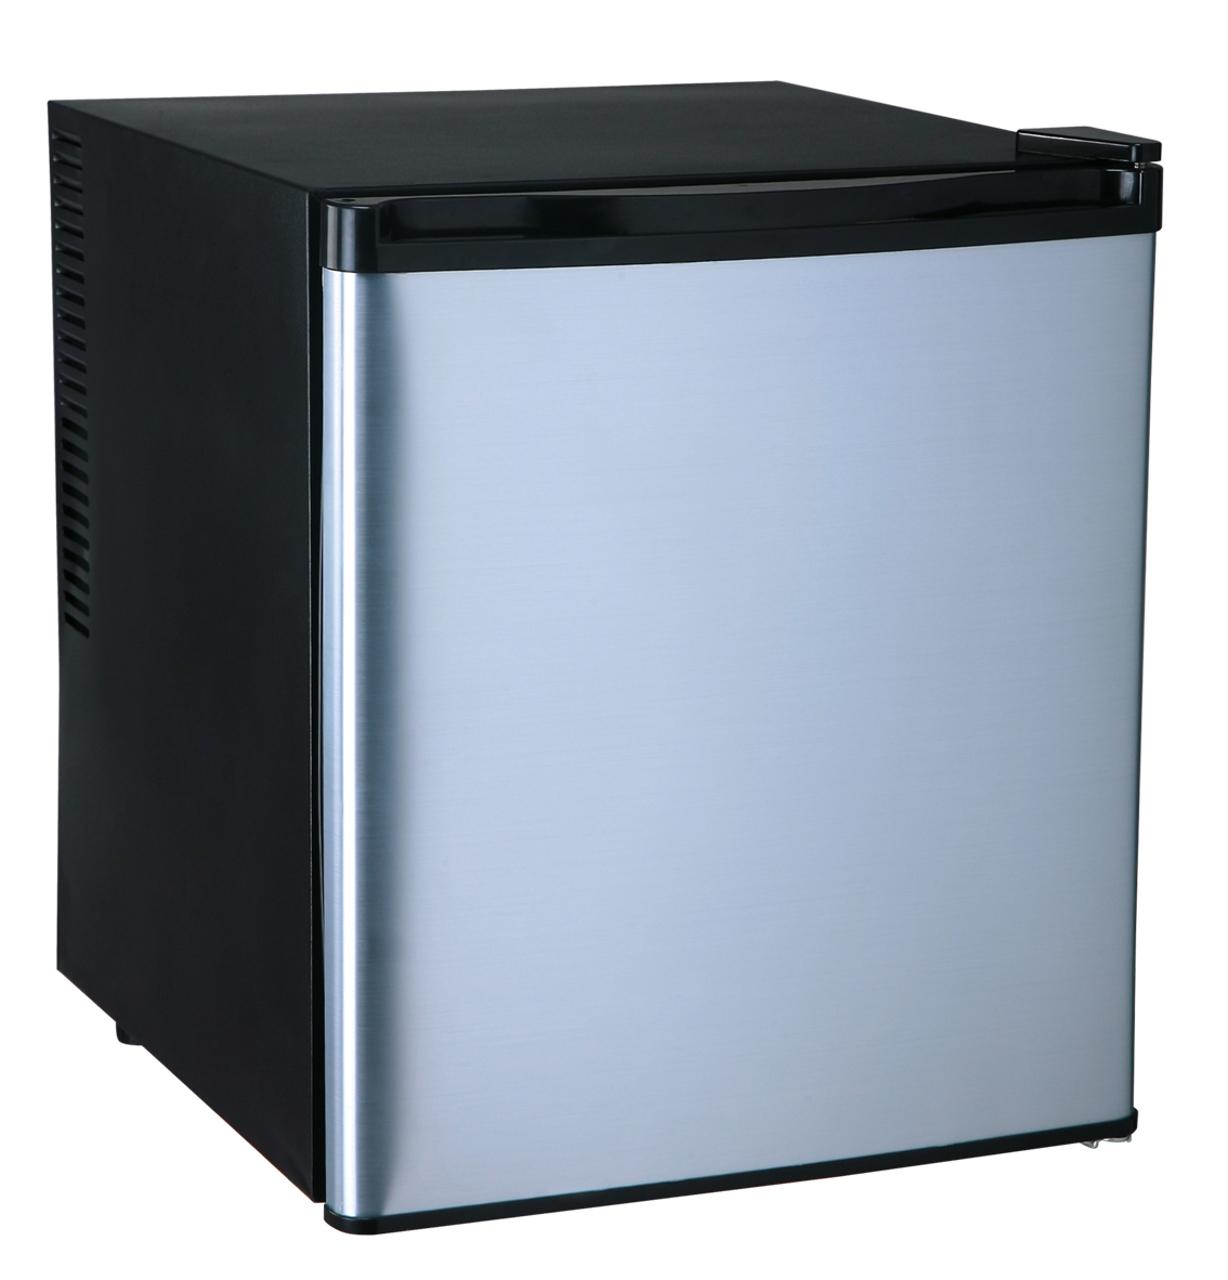 Termochladnička Guzzanti GZ 55 S